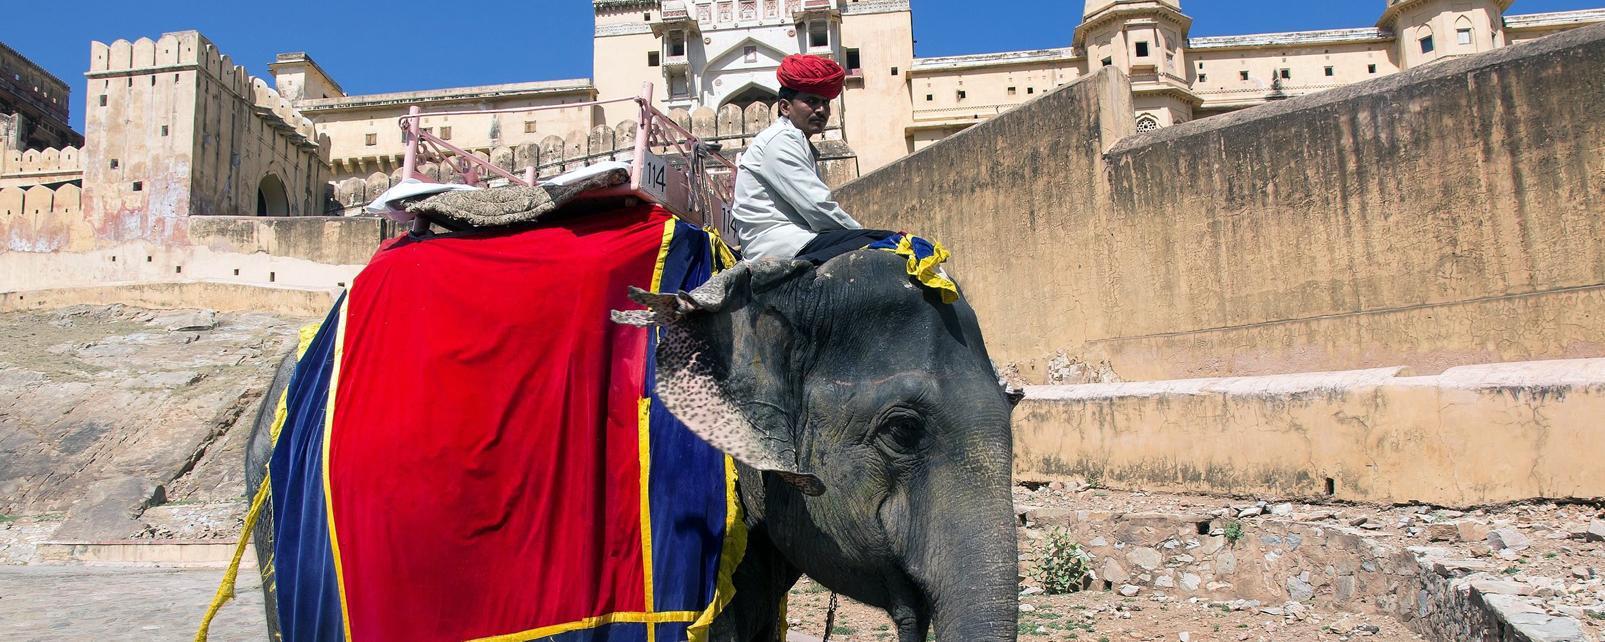 Asie; Inde; Rajasthan; Jaipur;